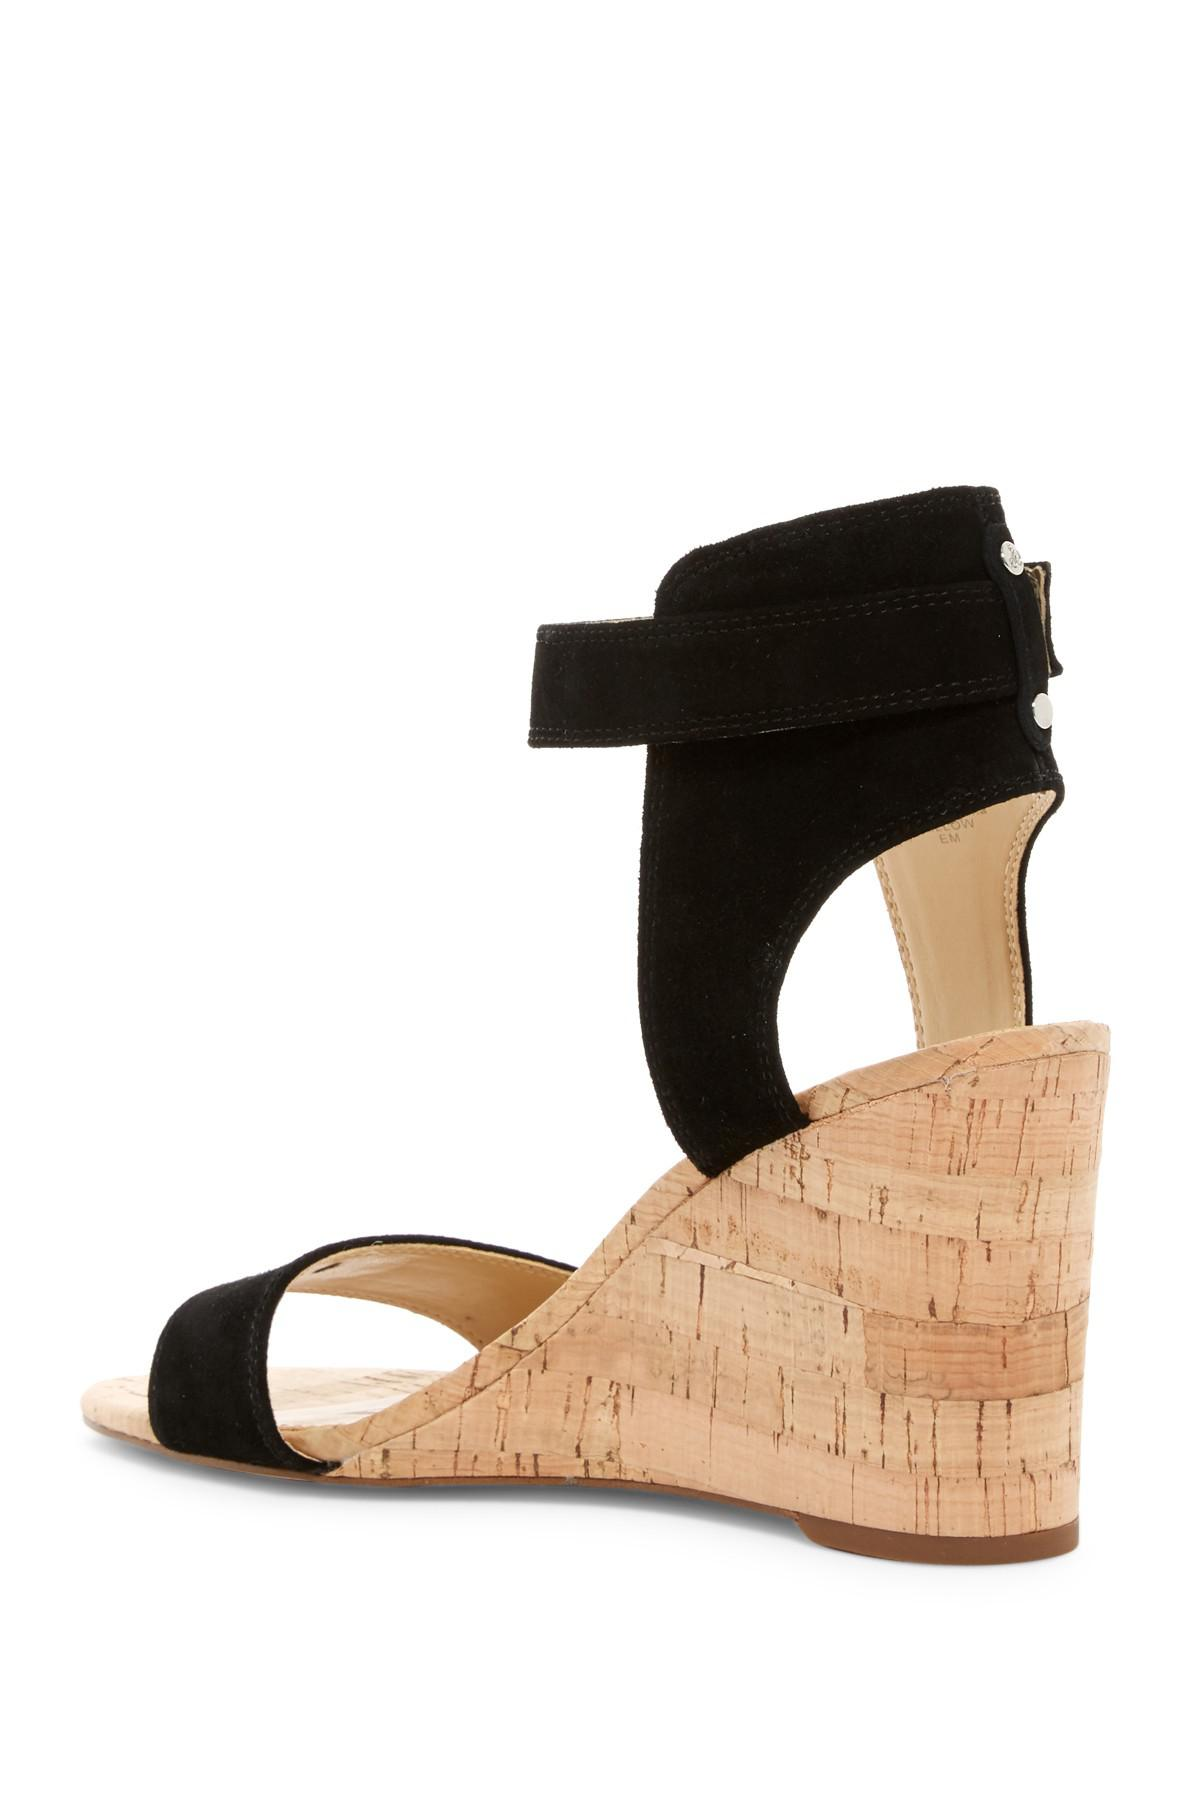 3b92549f18272b Lyst - Sam Edelman Willow Strappy Wedge Sandal in Black